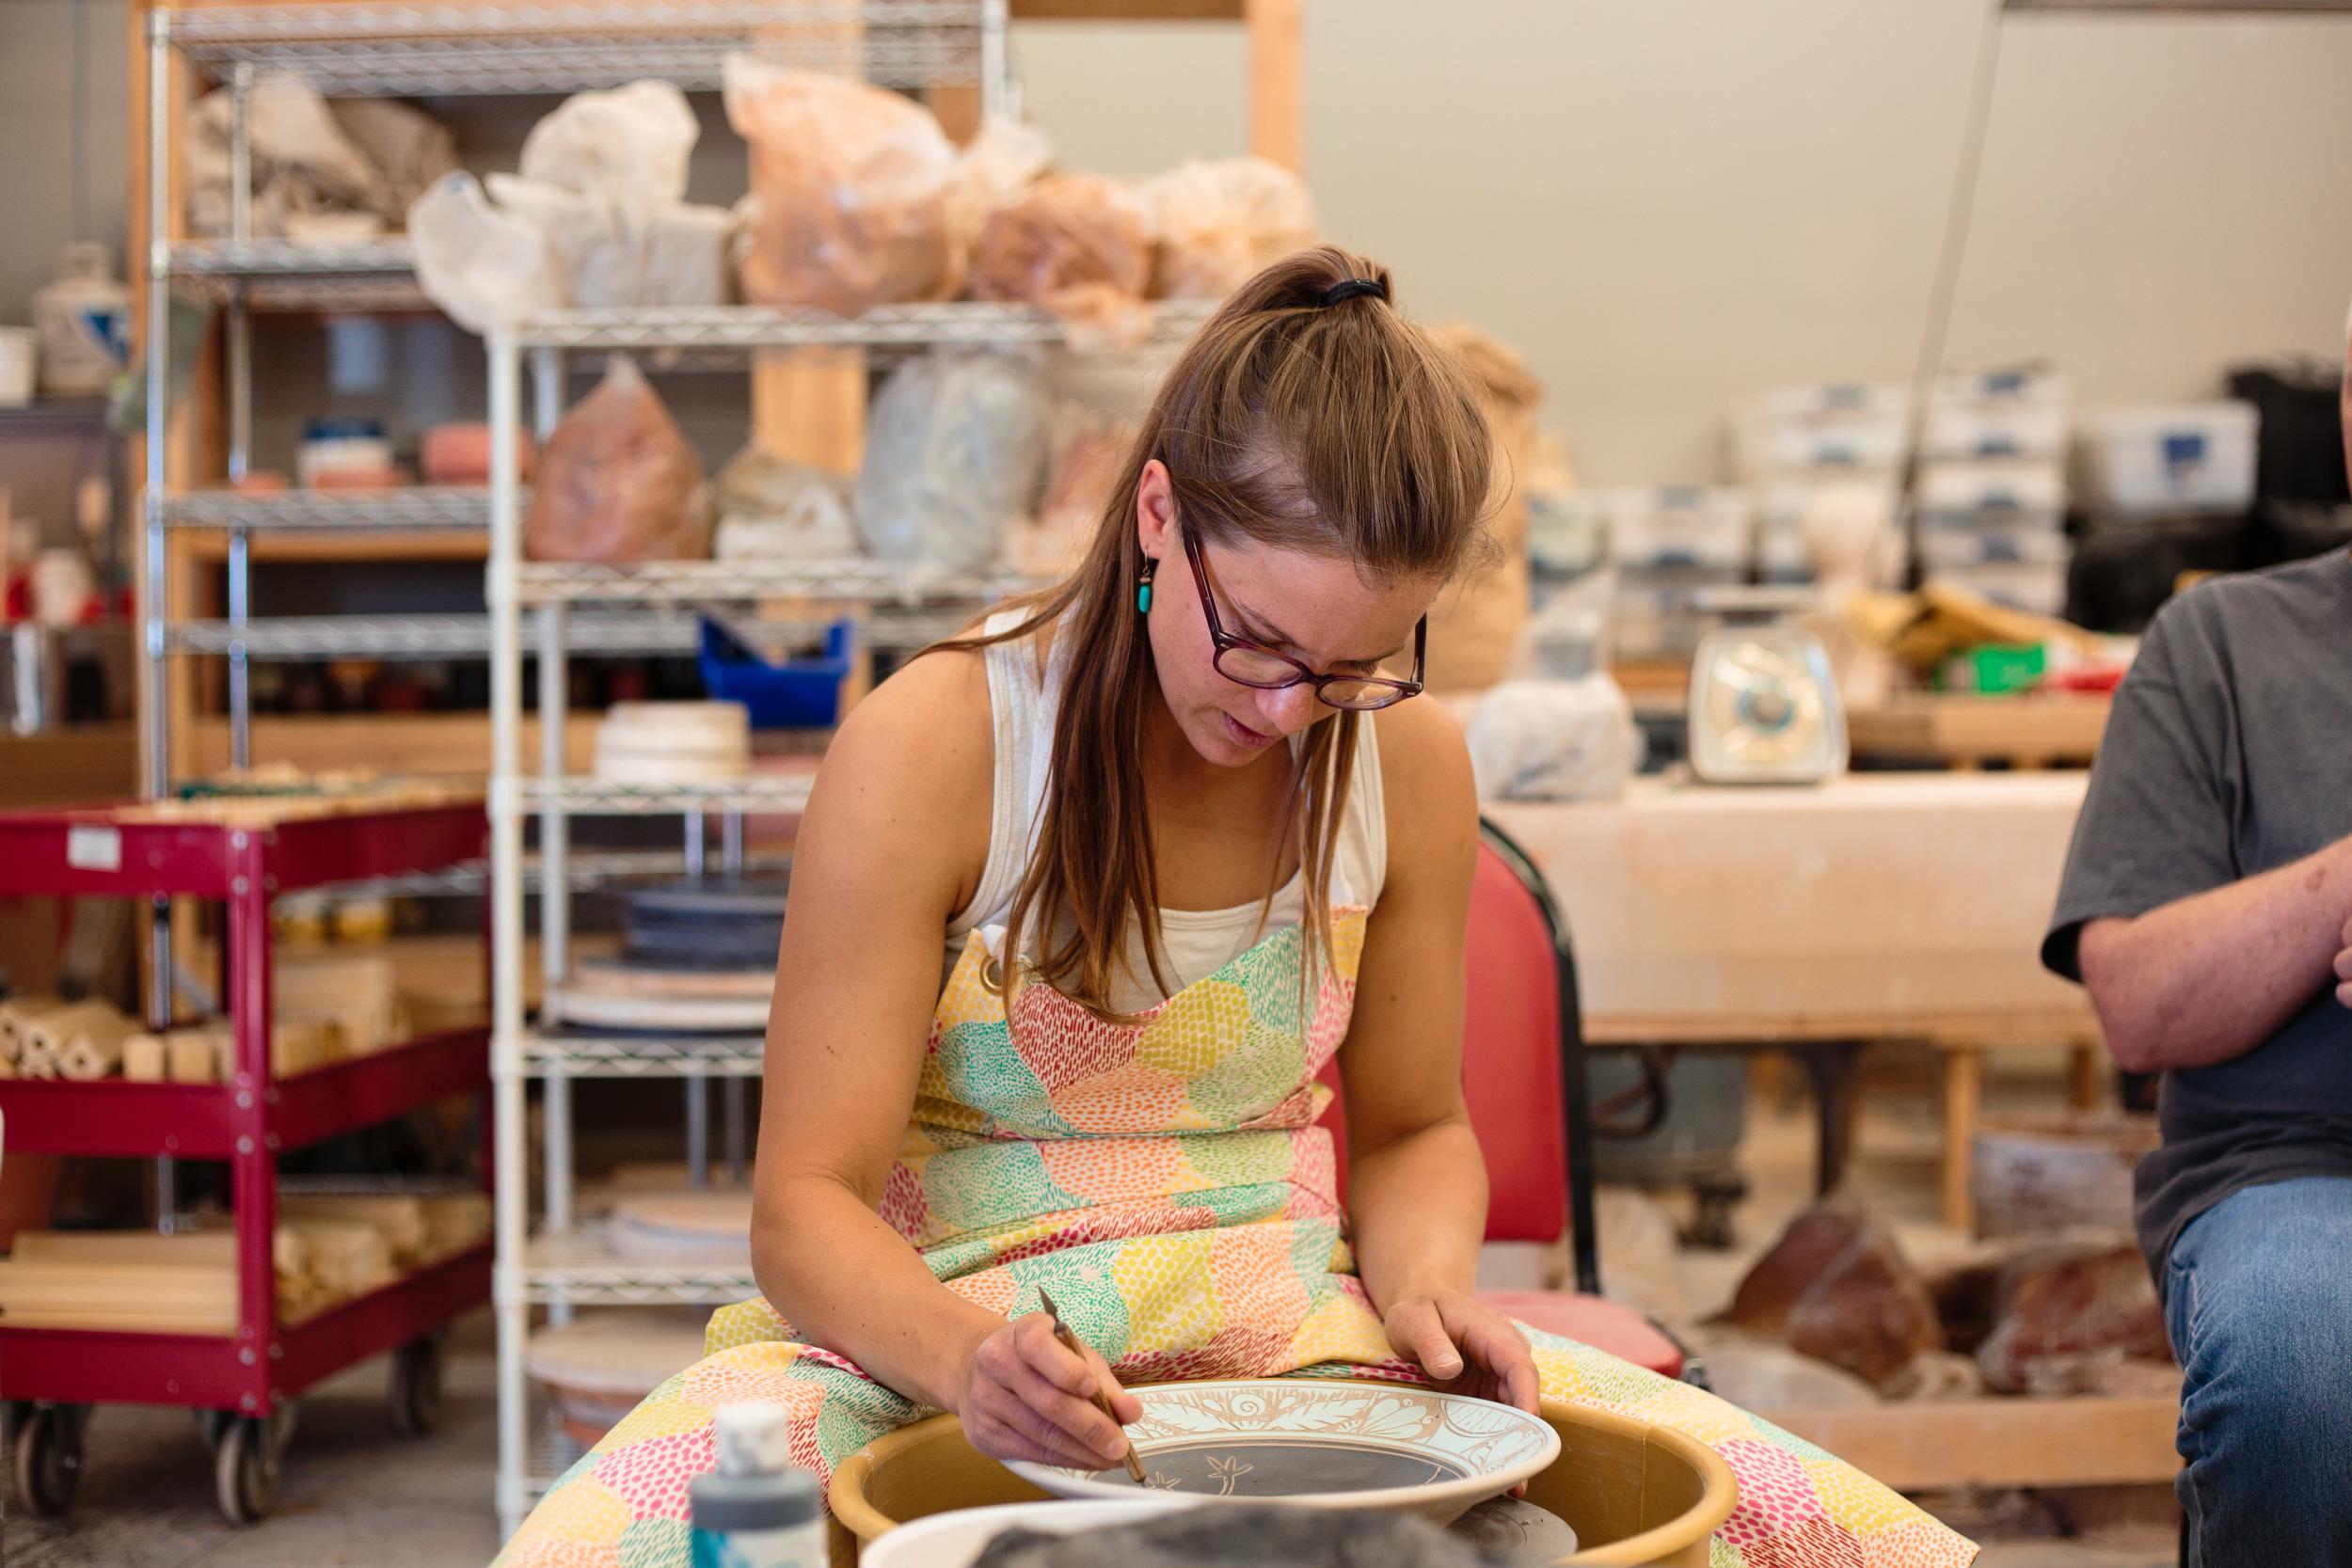 Potter working at pottery wheel studio interior